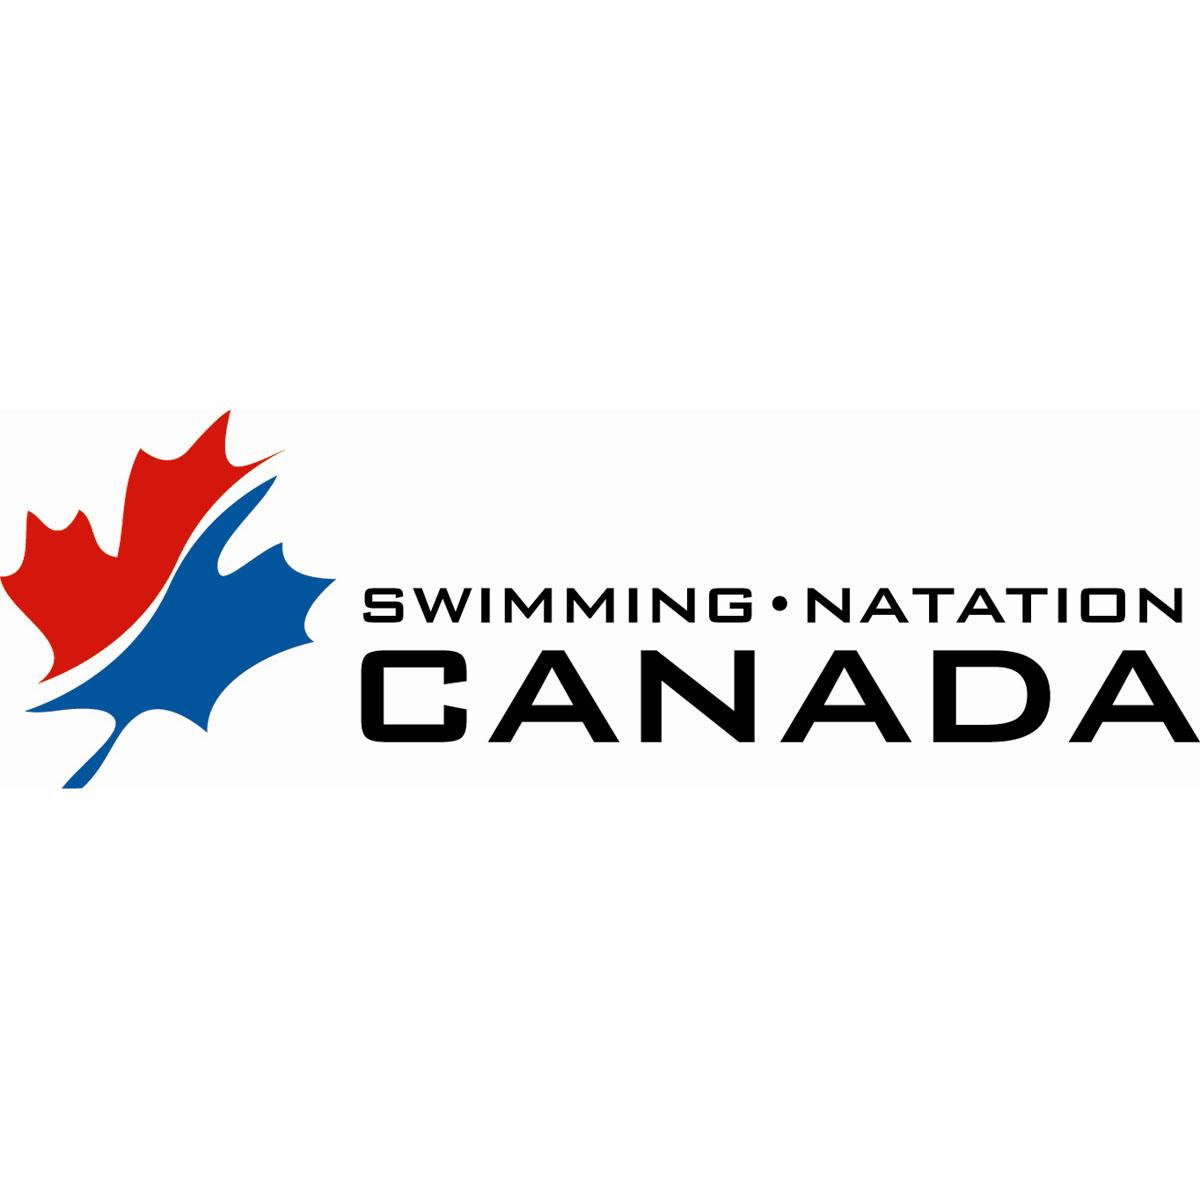 Swimming-Canada1.jpg